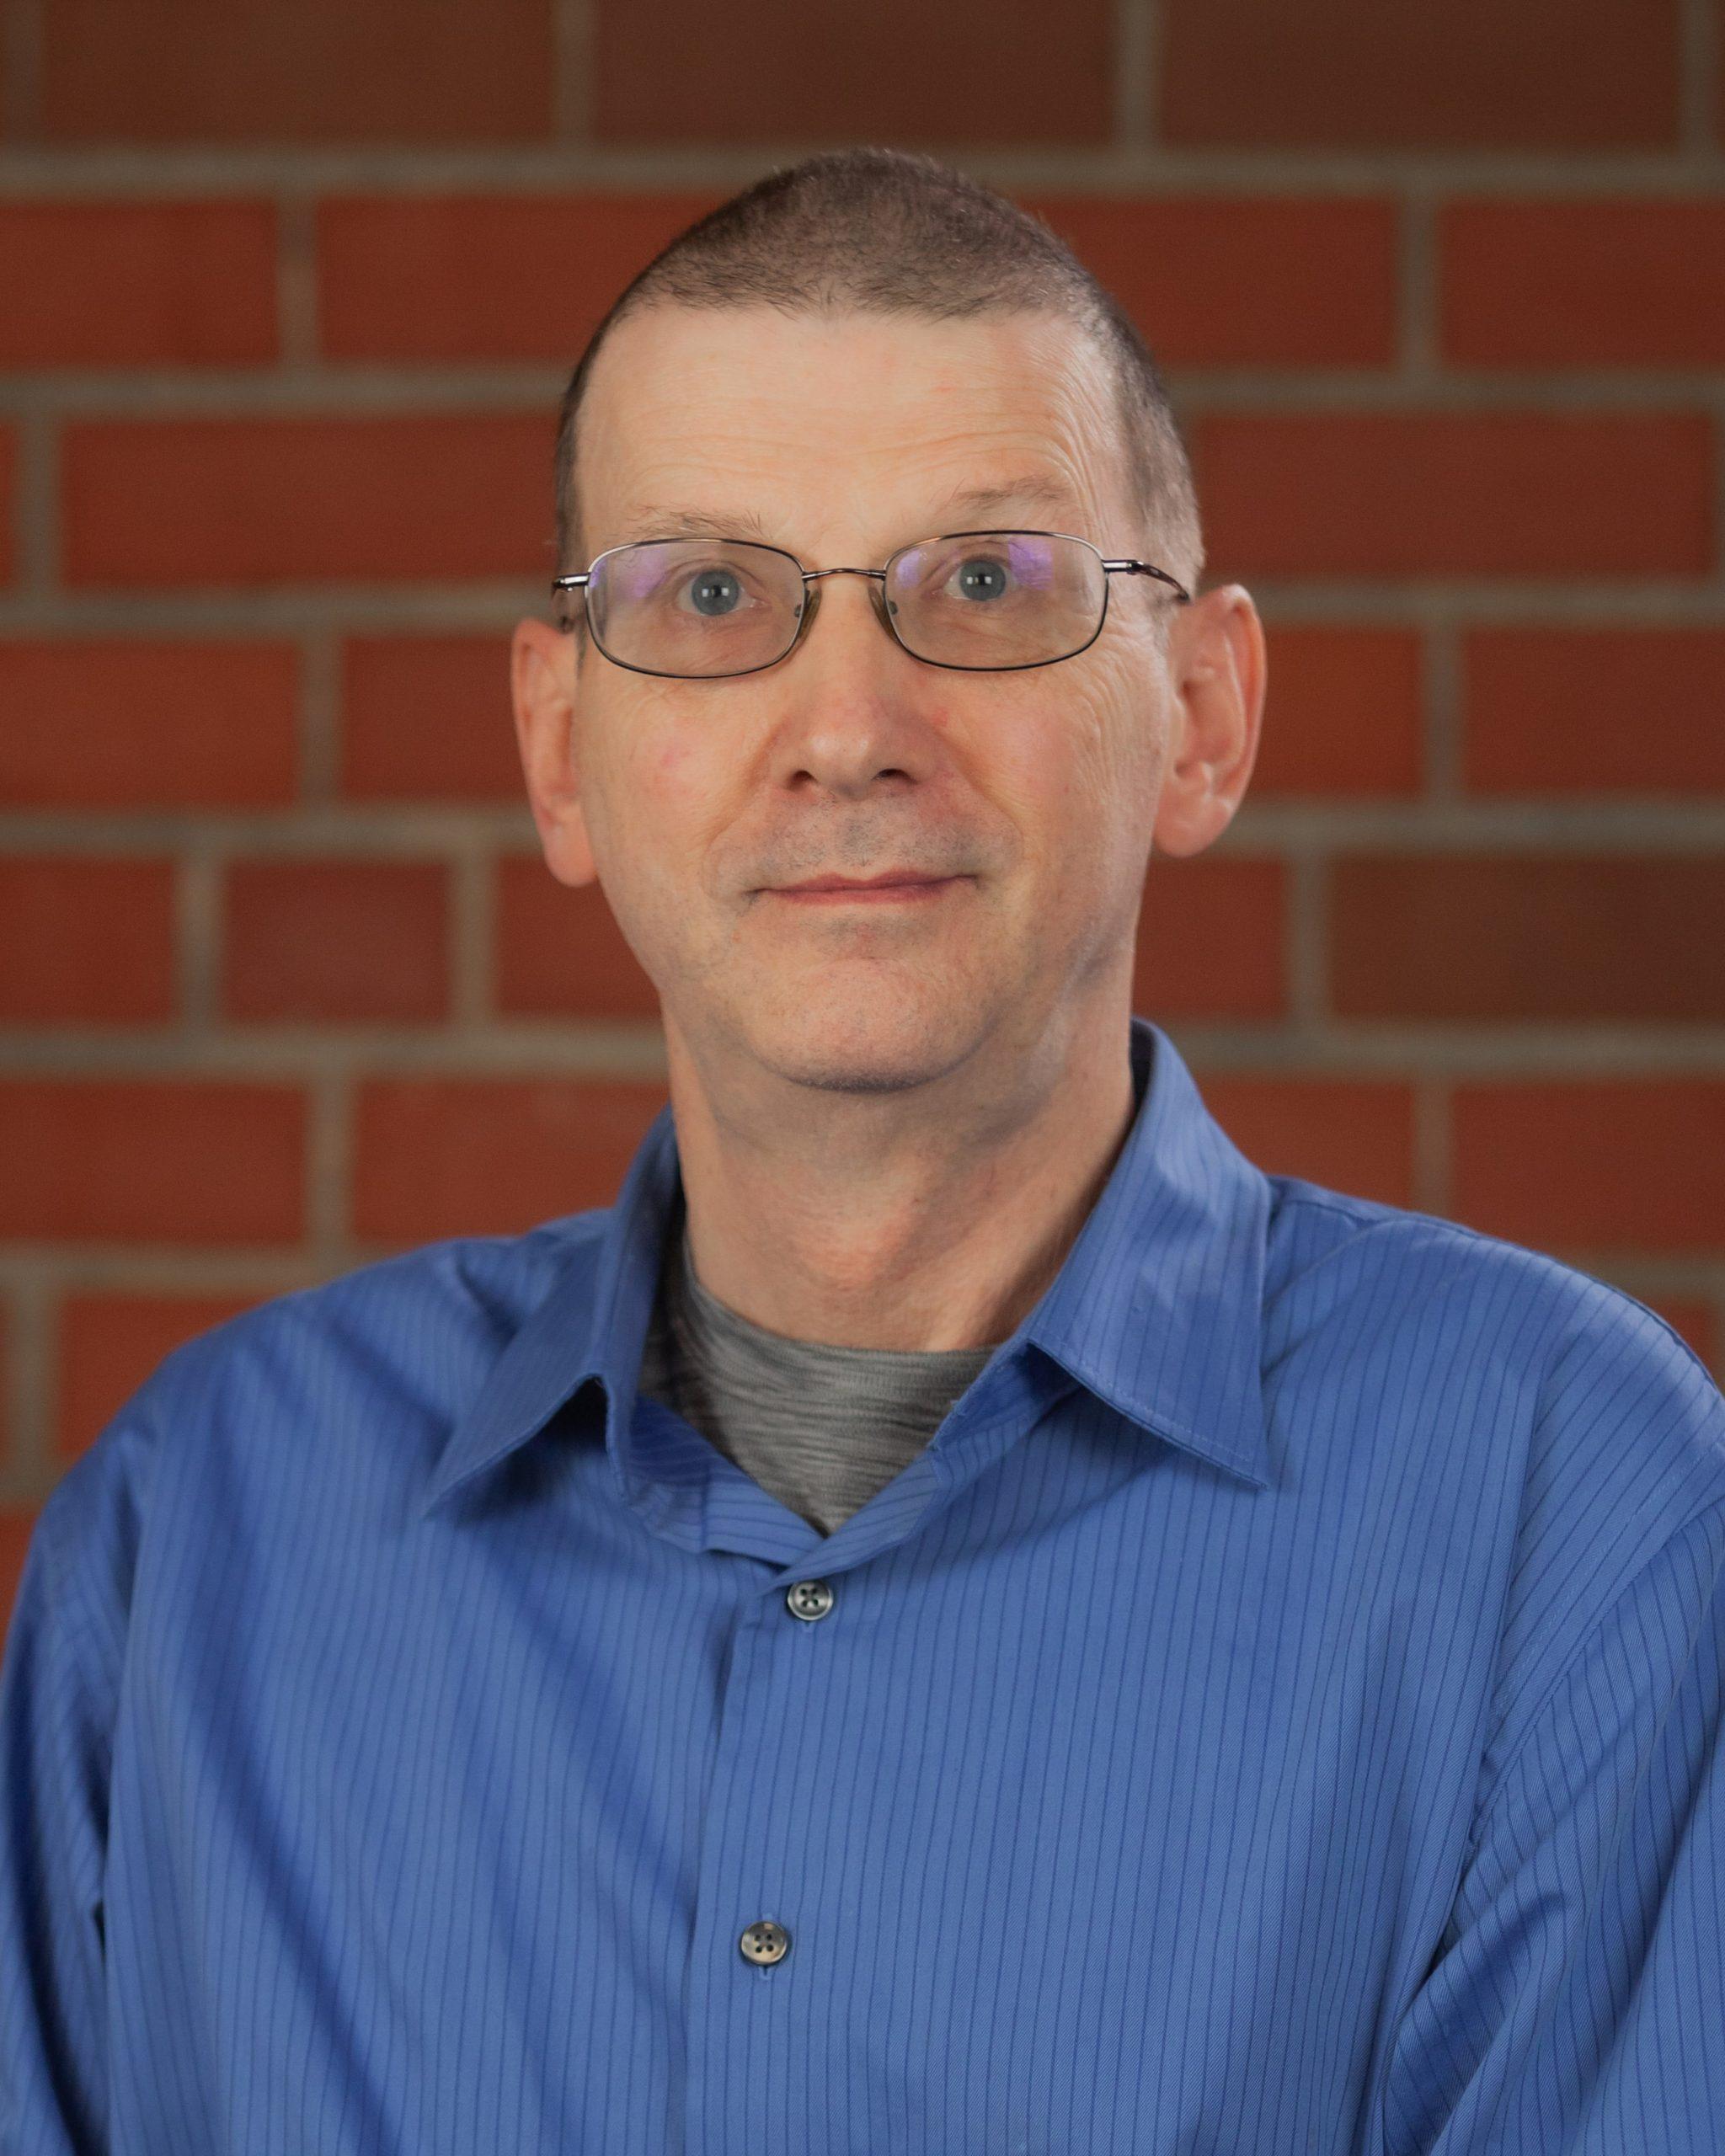 Image of Derek Bradford